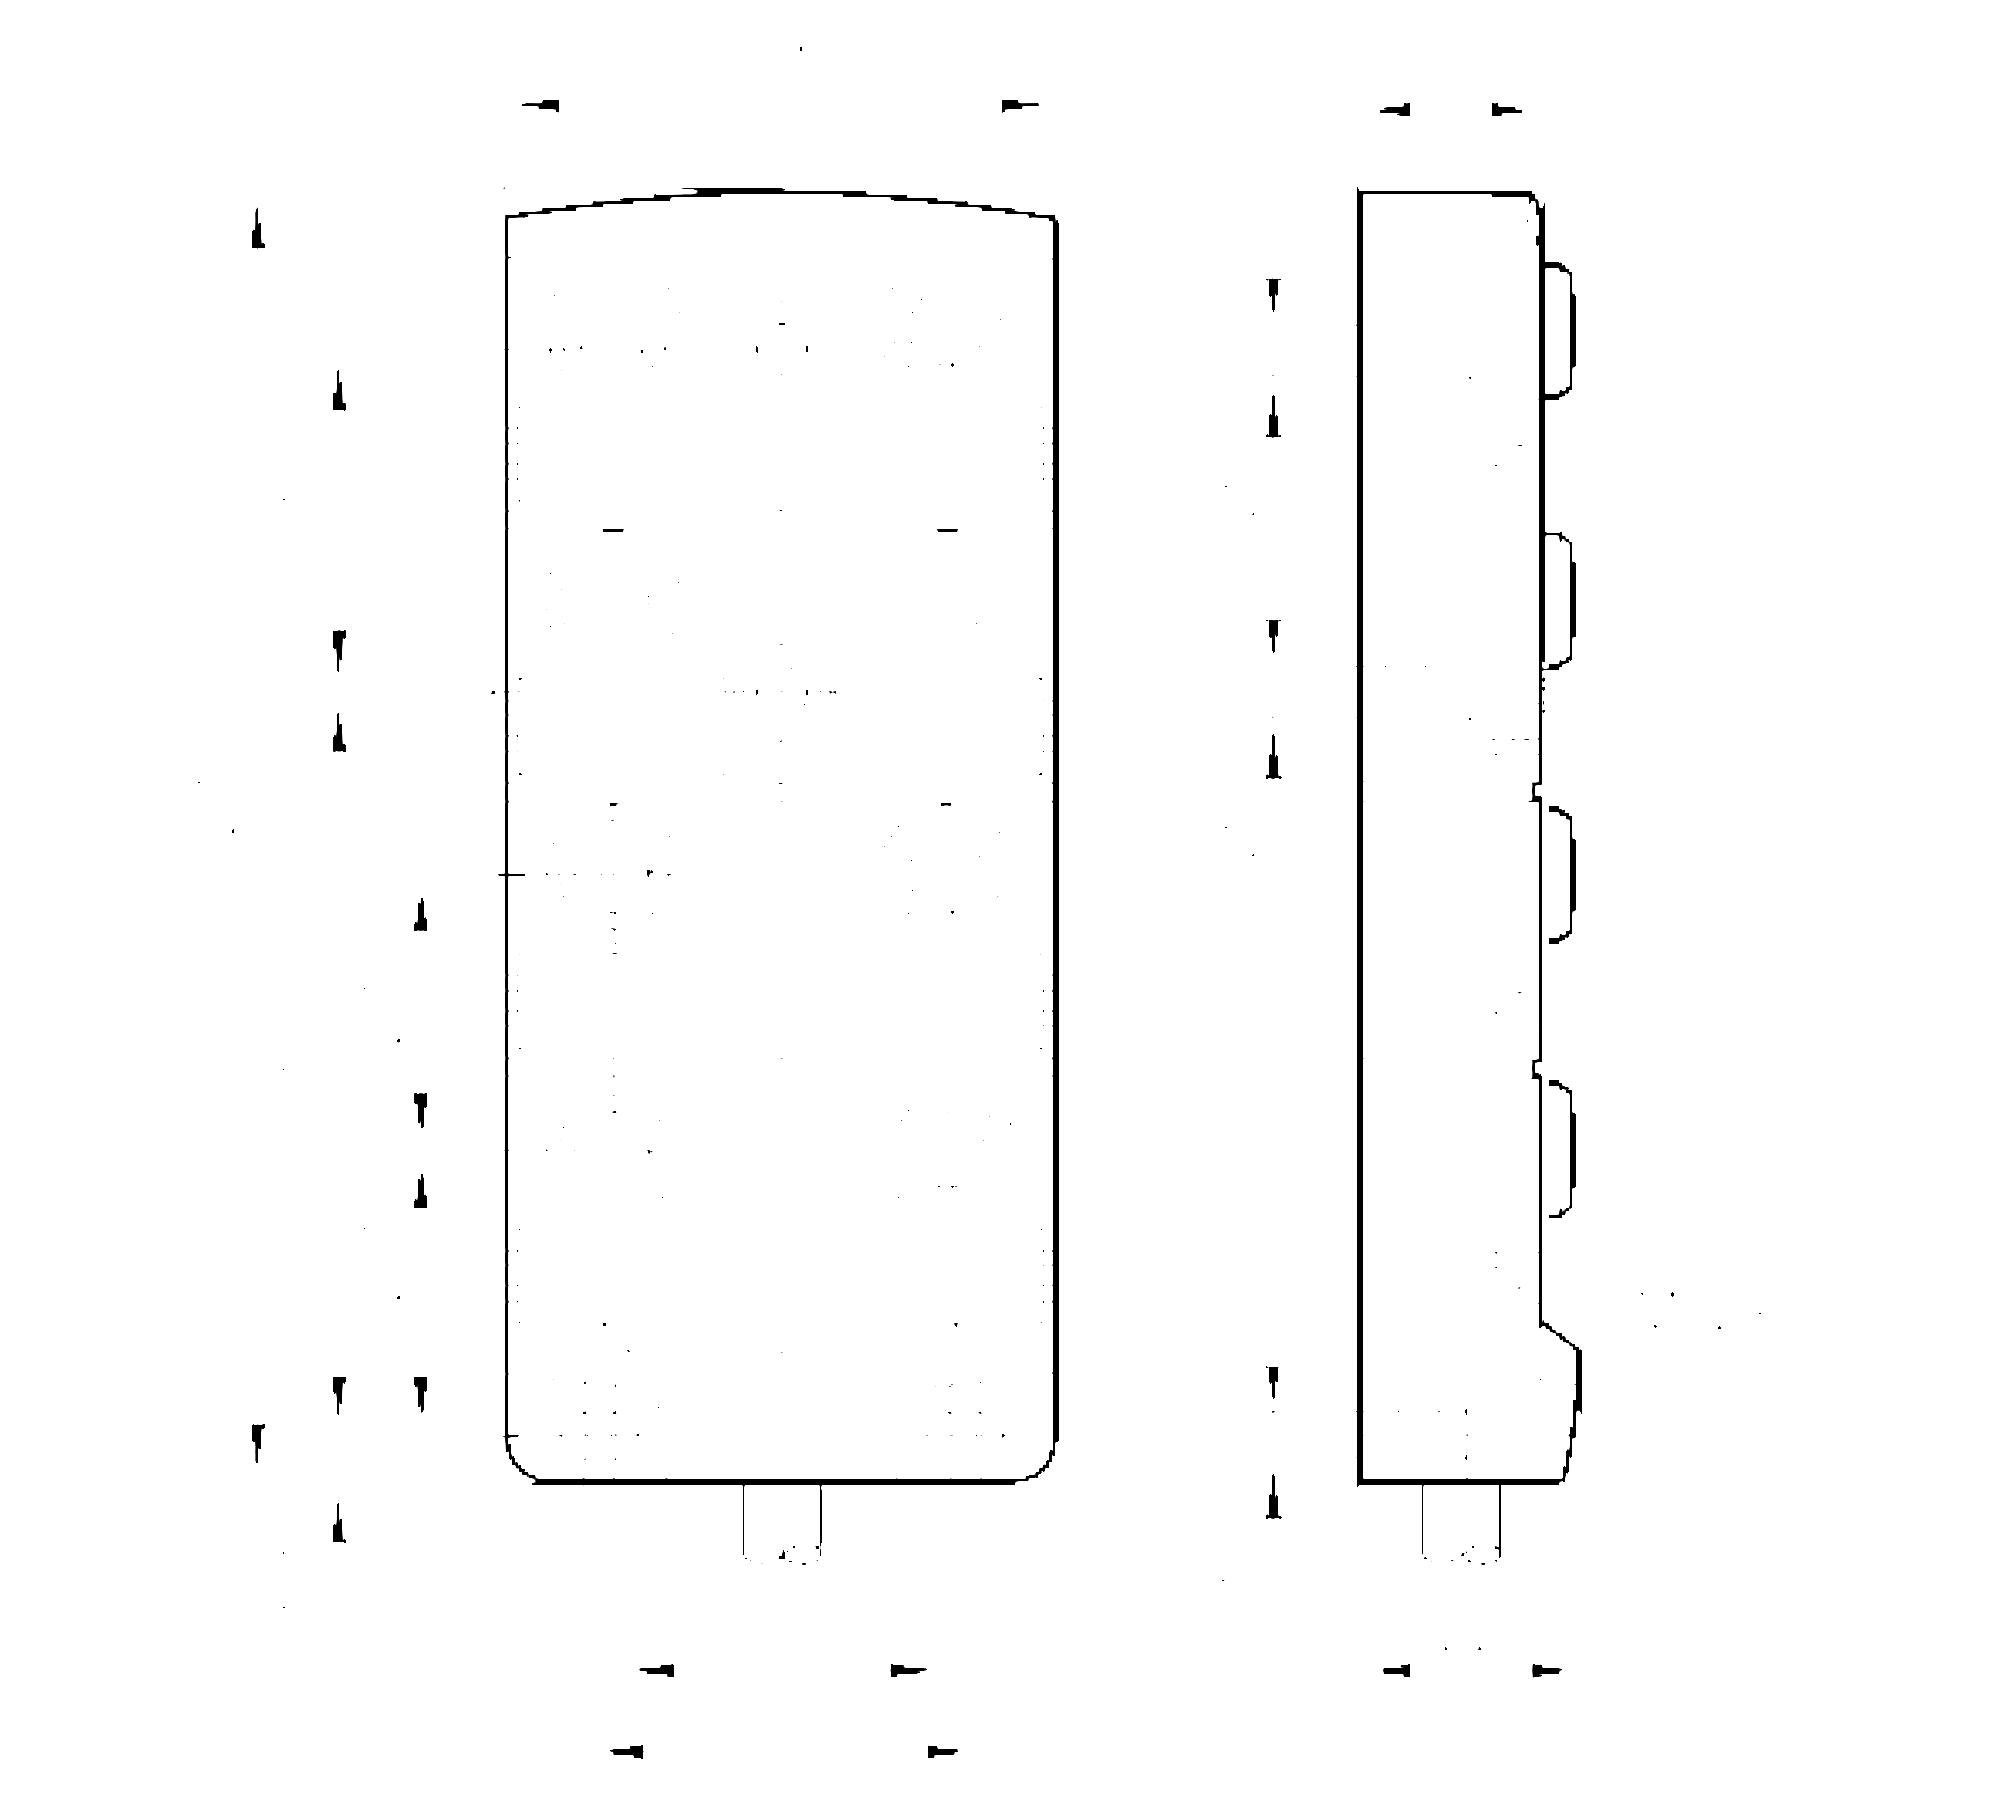 ebc034 - wiring block